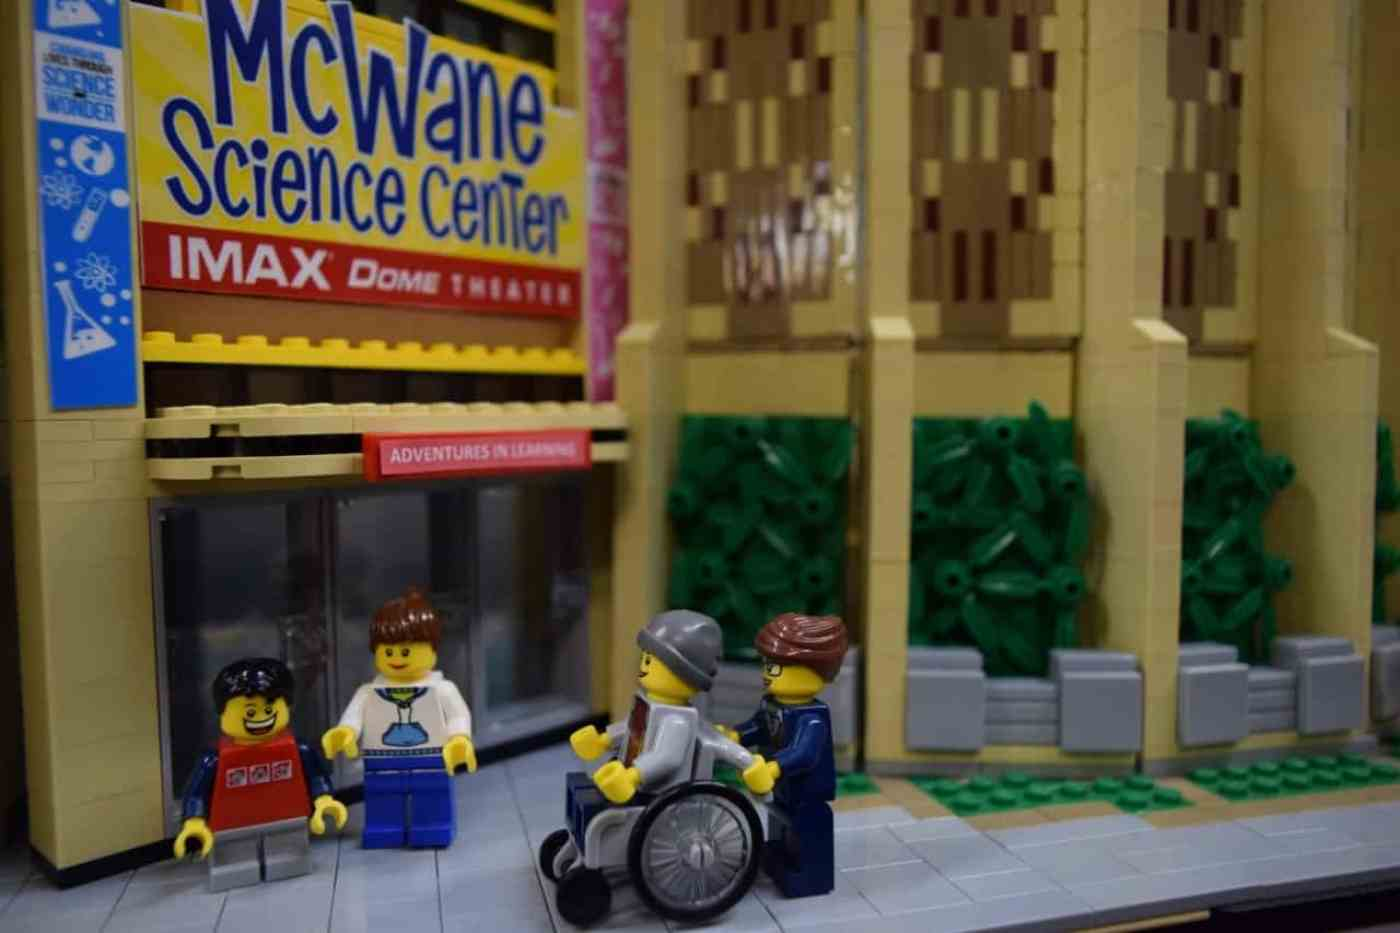 Birmingham, McWane Science Center, LEGO, Legos, Lego Day, Lego Day at McWane Science Center